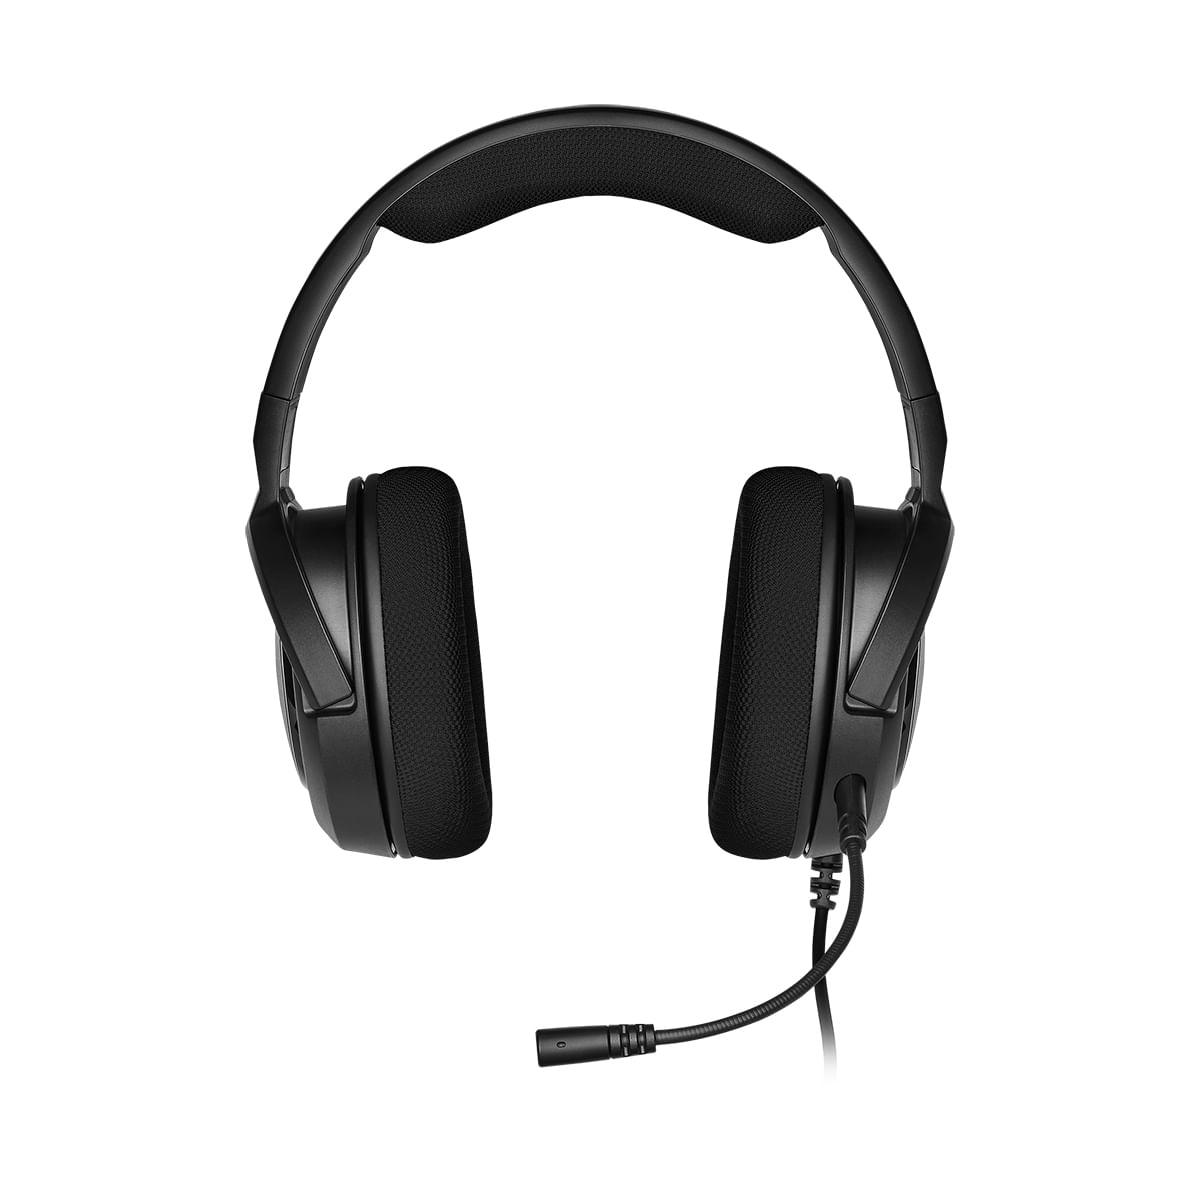 Fone de Ouvido Gamer Headset Corsair HS45 Surround Preto